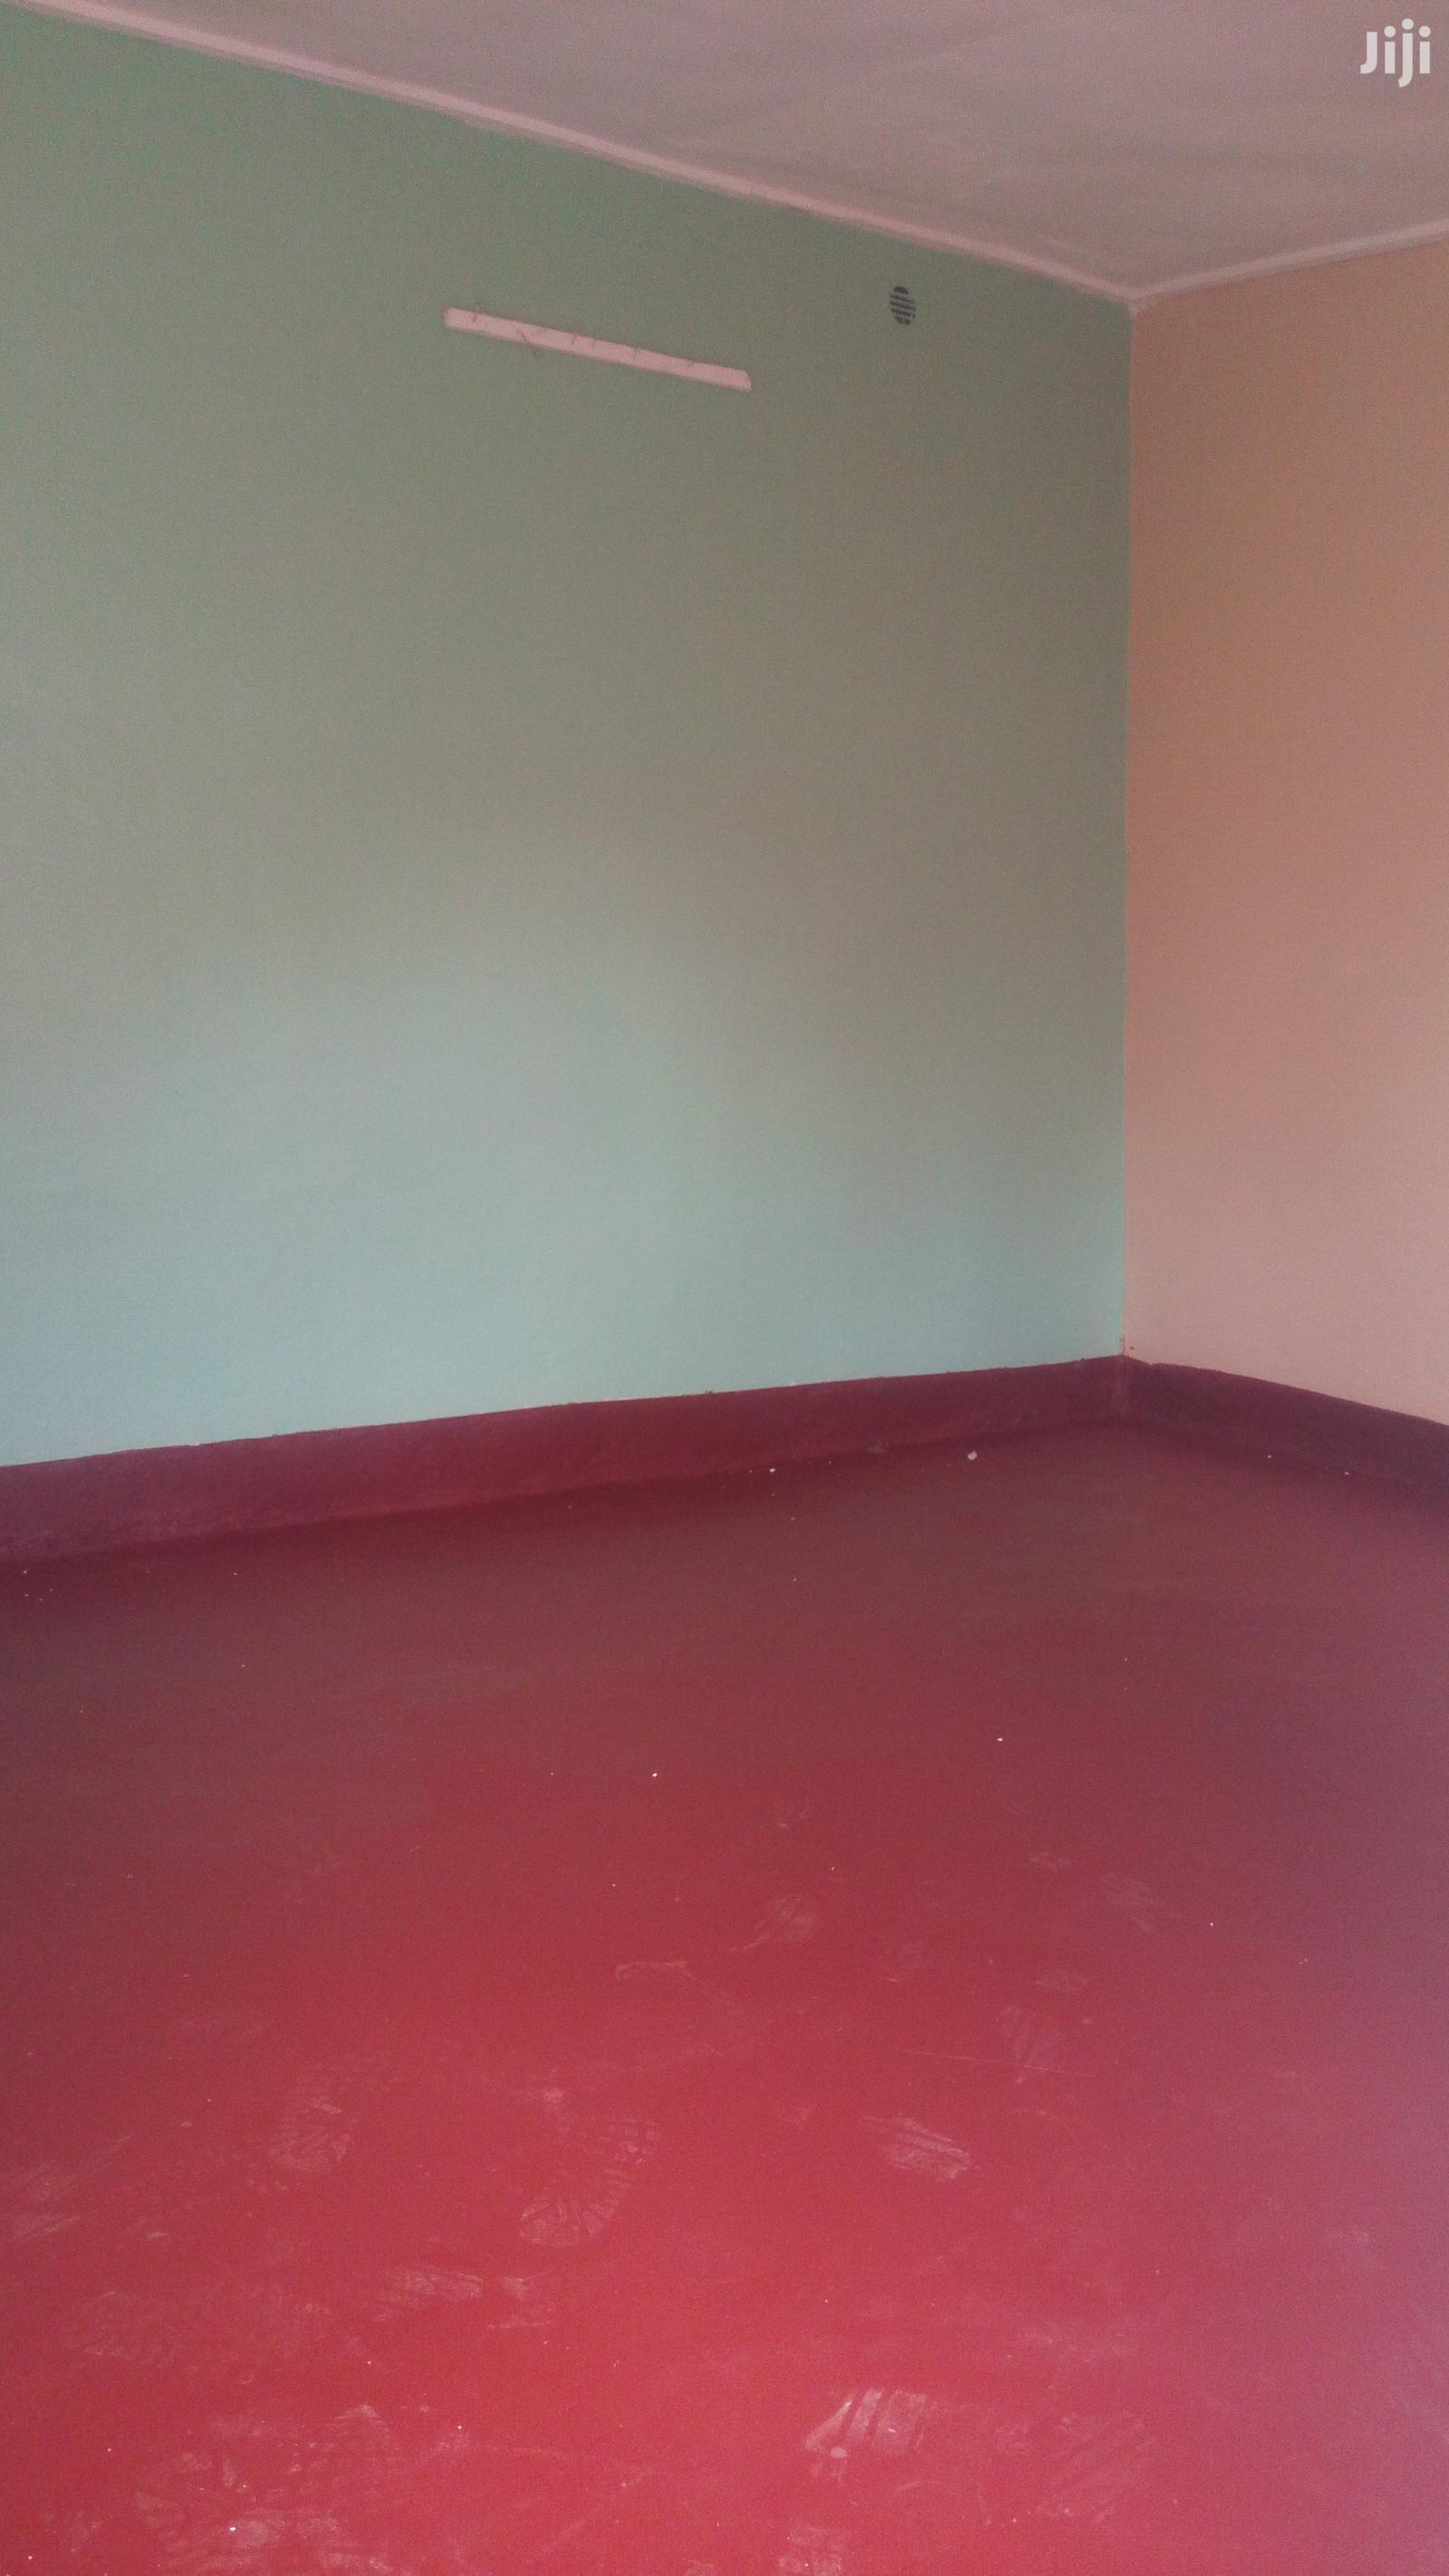 Single Room to Let in Ruaka | Houses & Apartments For Rent for sale in Ndenderu, Kiambu, Kenya